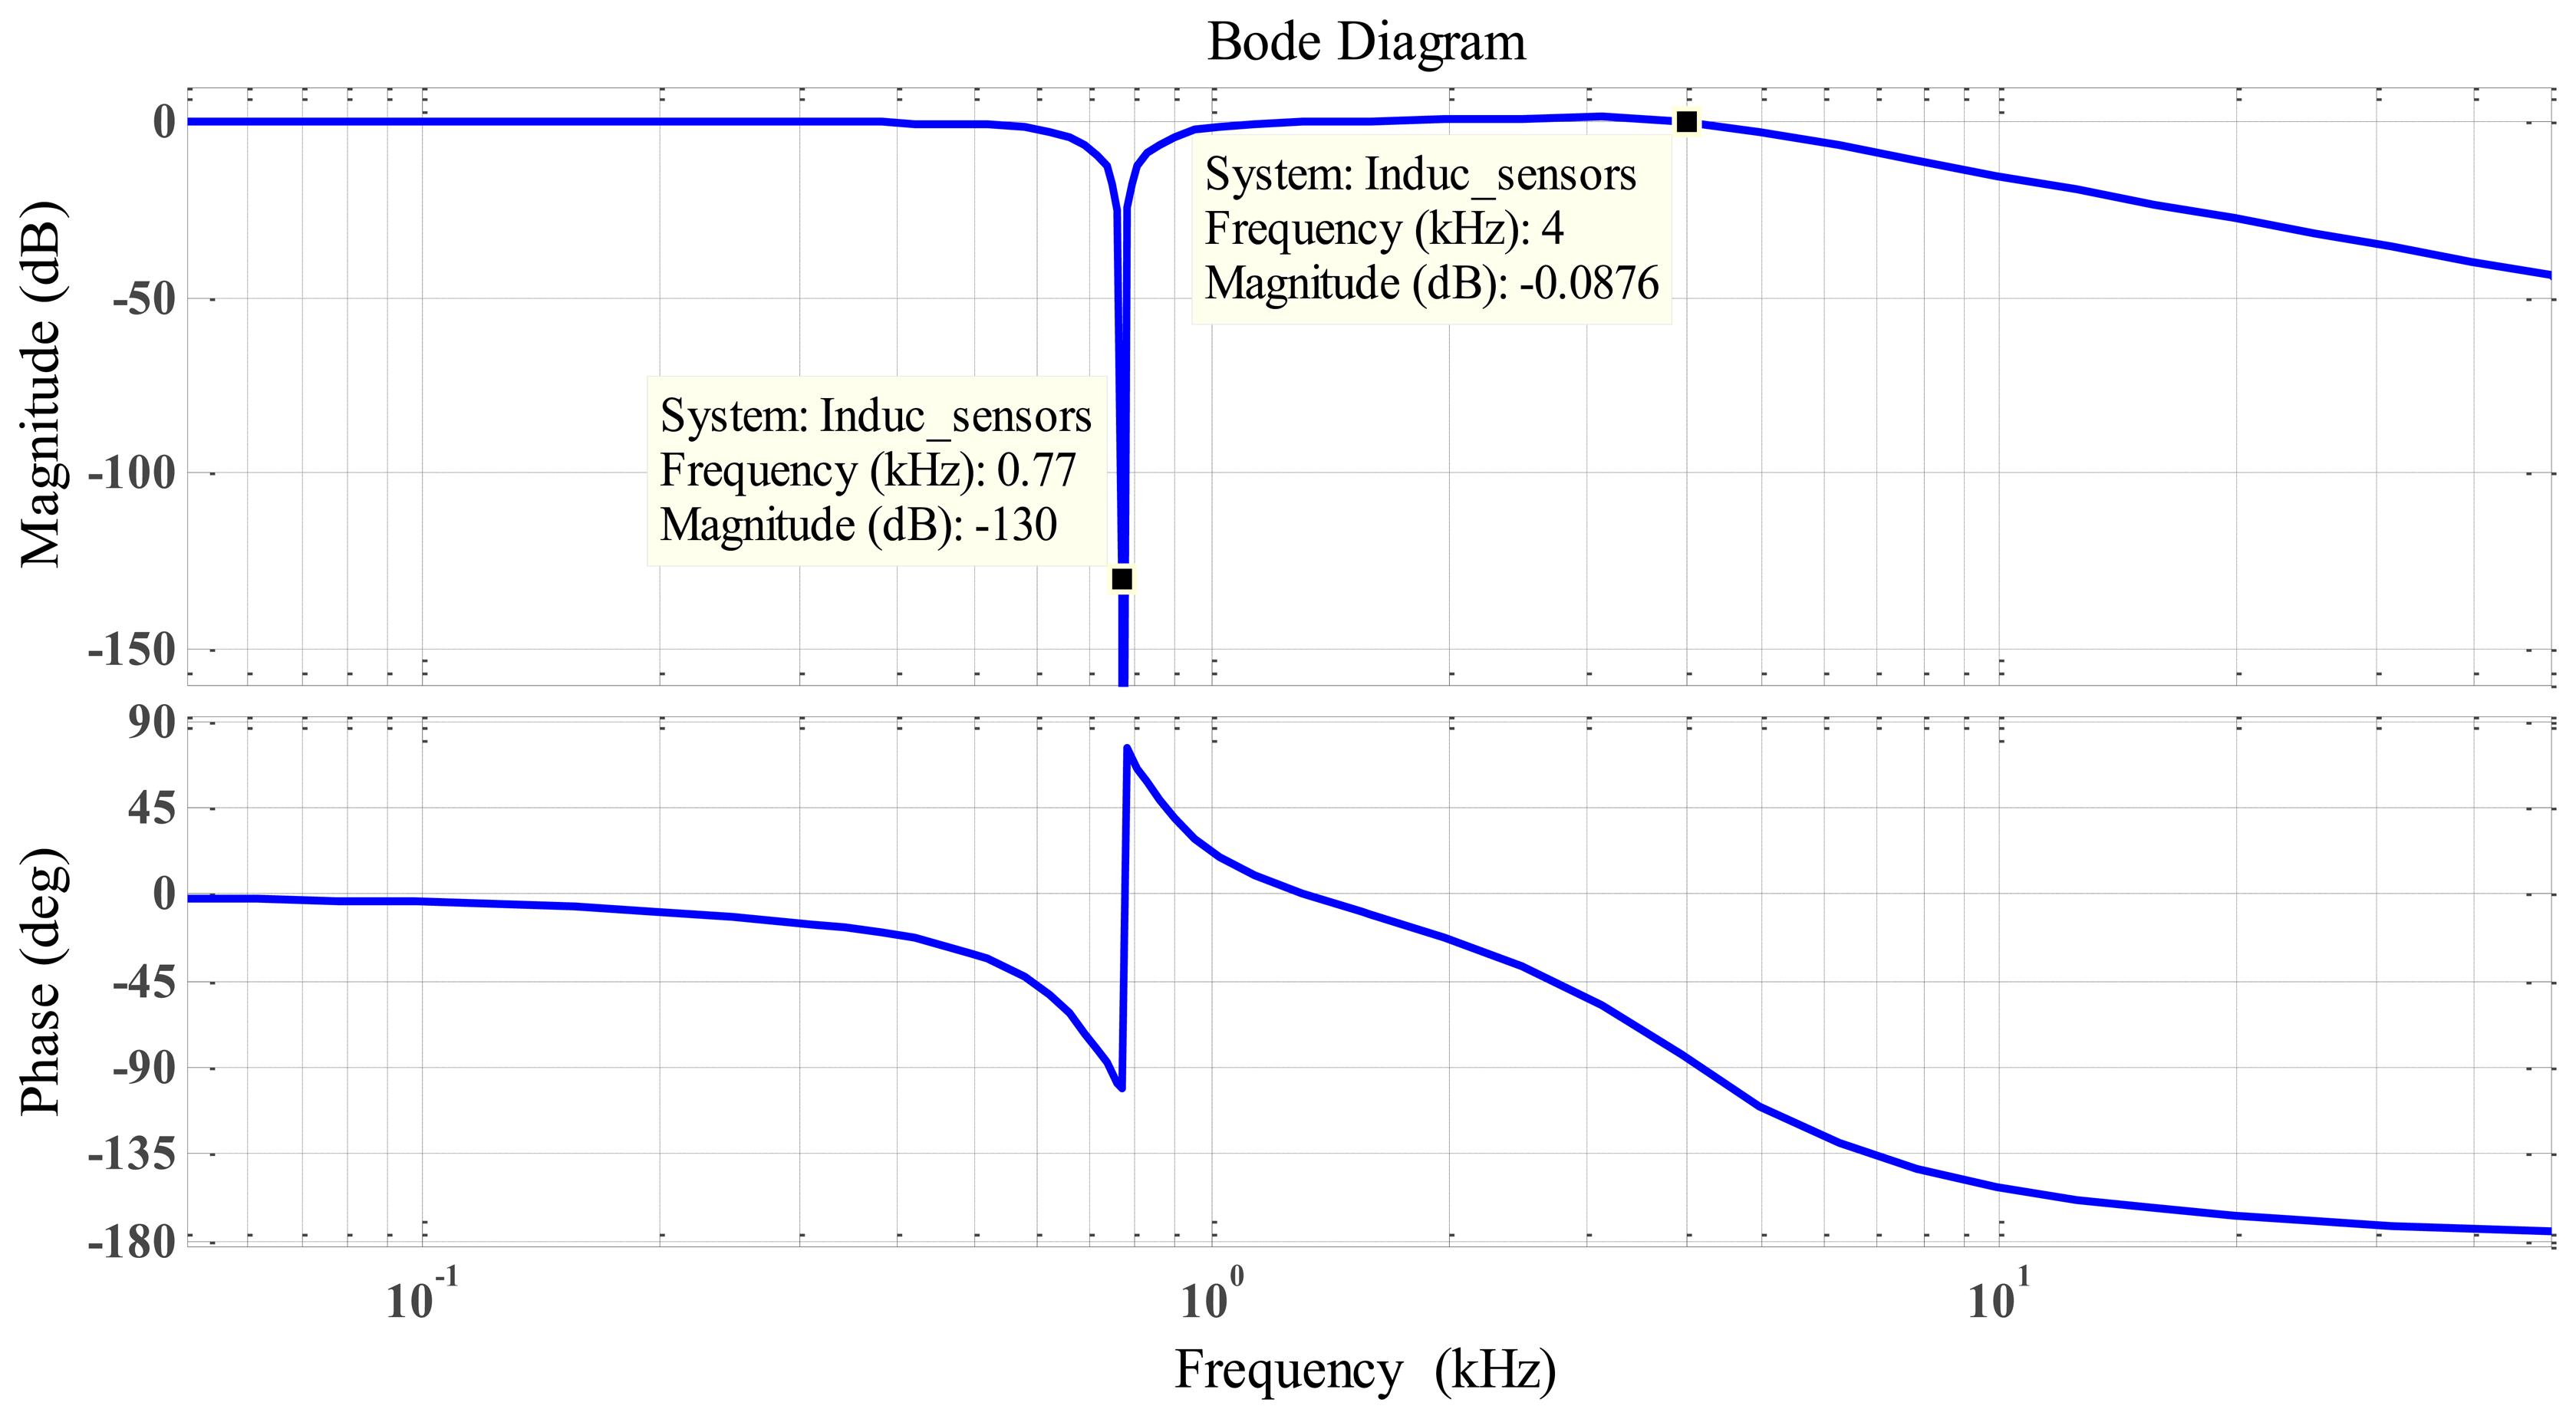 Sensors Free Full Text Inductive Displacement With A Proximity Sensor Comprising Resonant Oscillatory Circuit 14 12640f21 1024